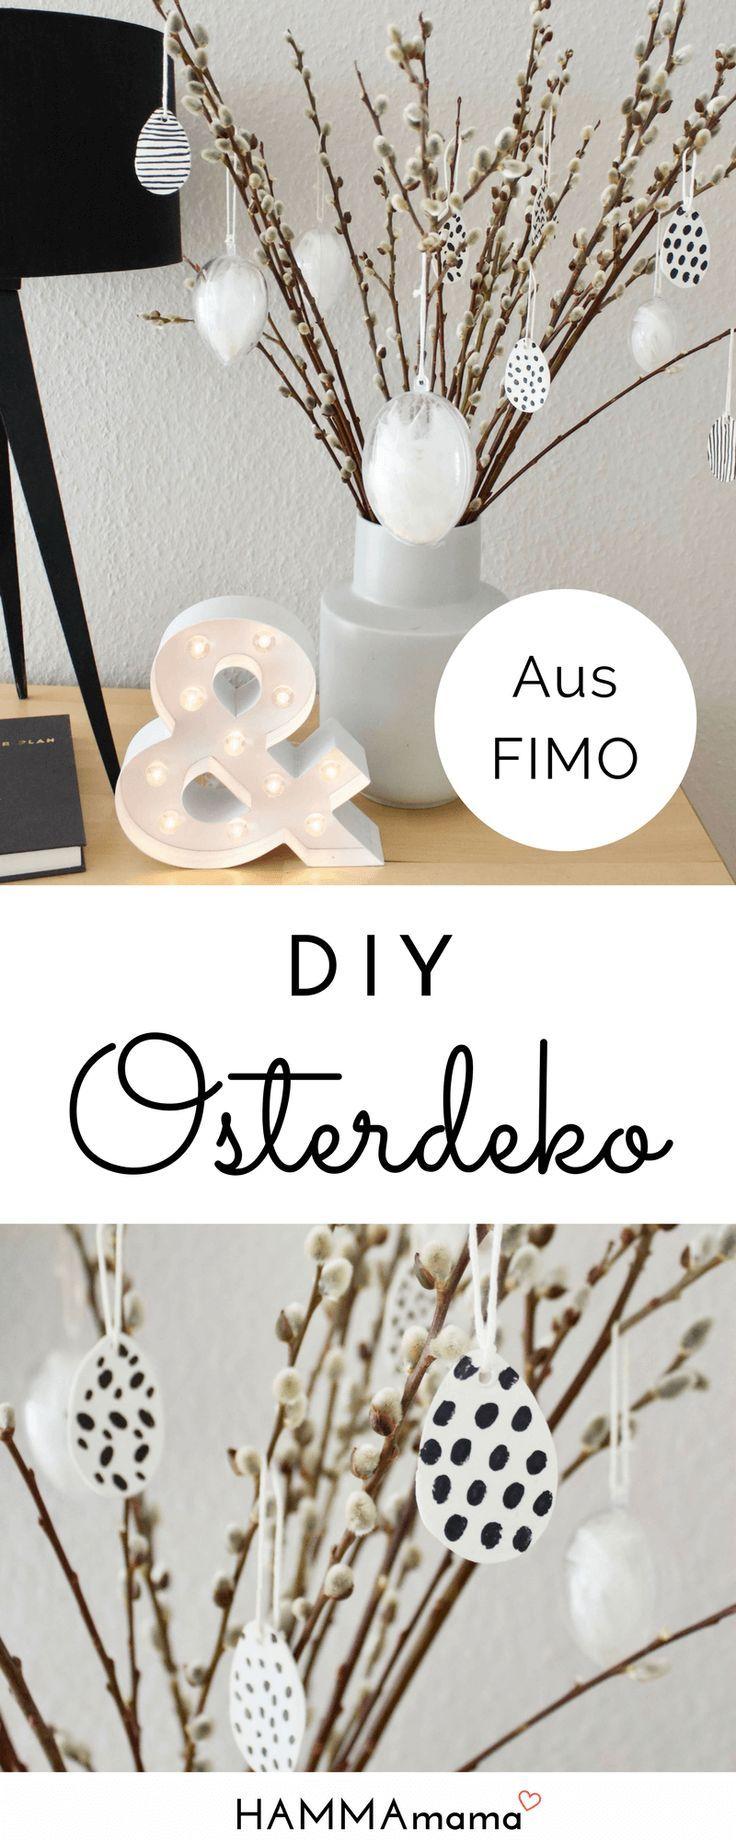 Diy Ostereier Zum Aufhangen Skandinavische Dekoration Fur Ostern